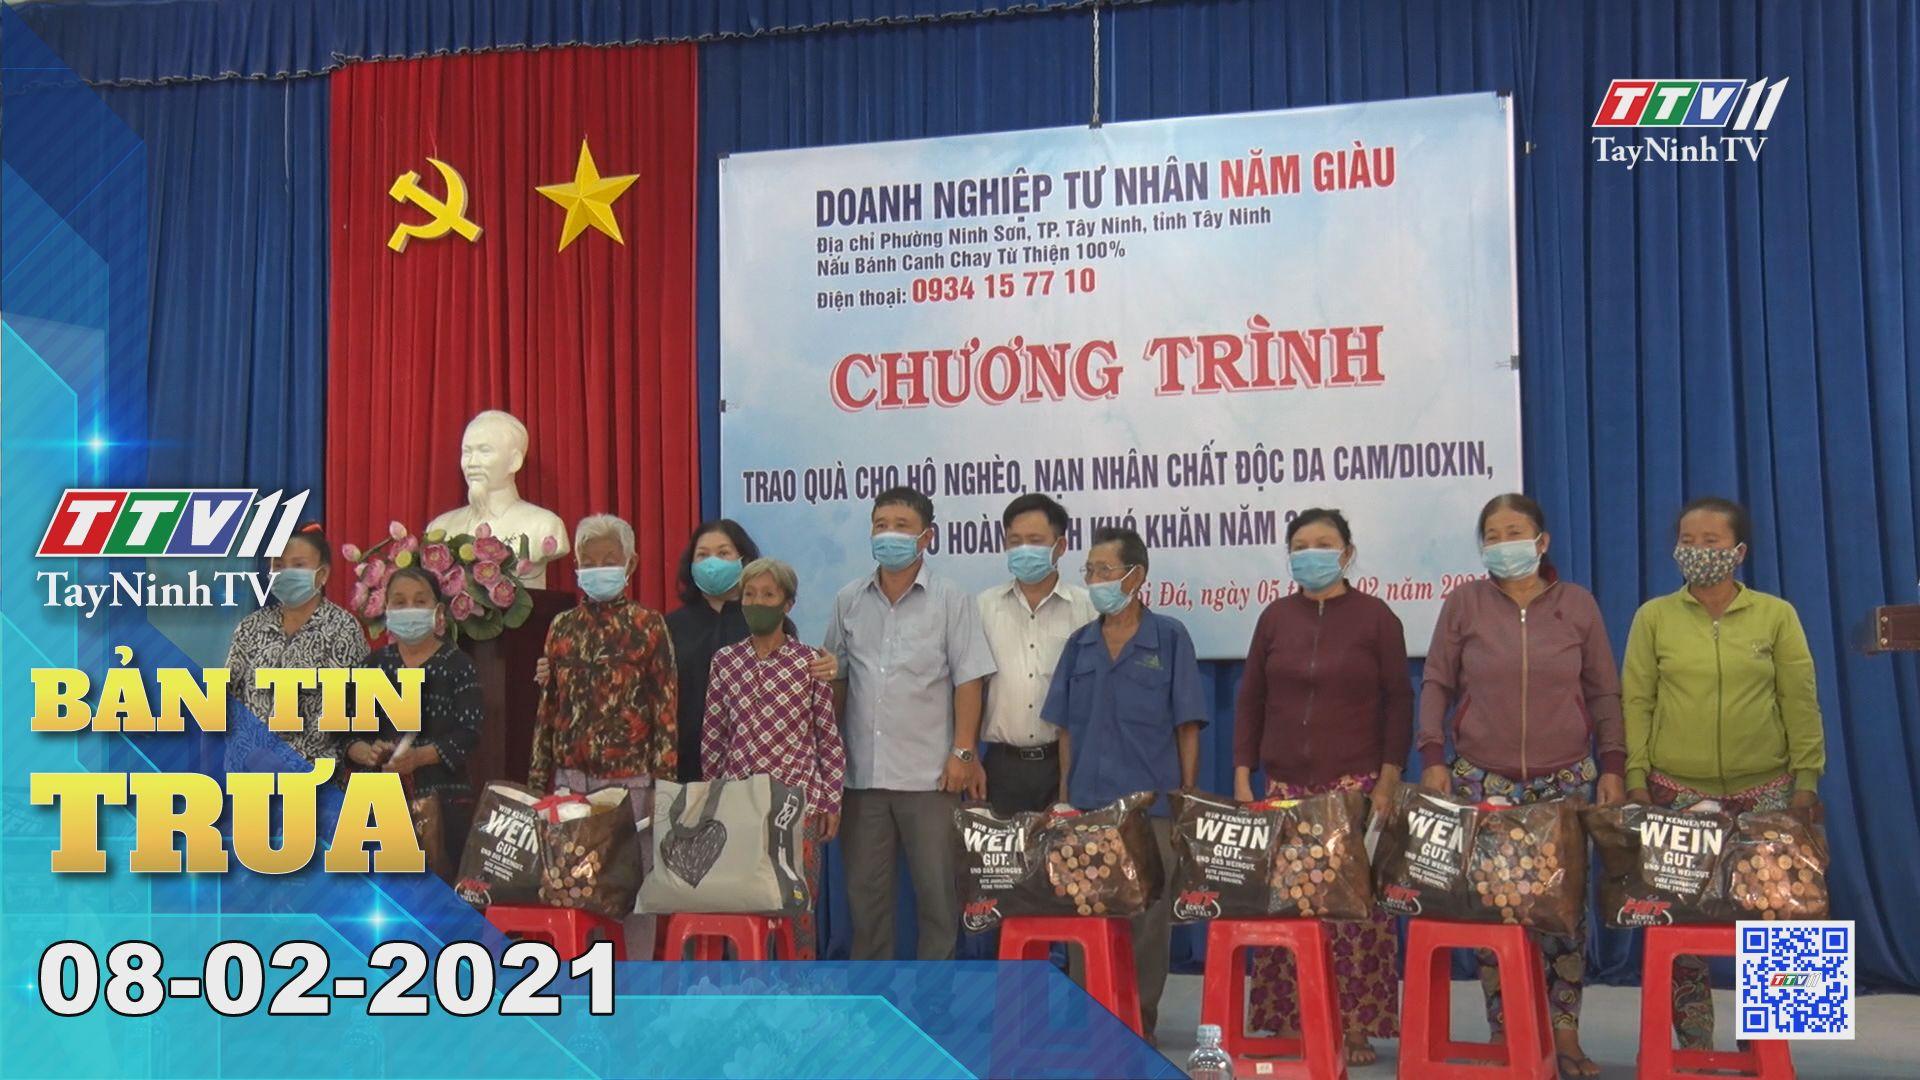 Bản tin trưa 08-02-2021 | Tin tức hôm nay | TayNinhTV